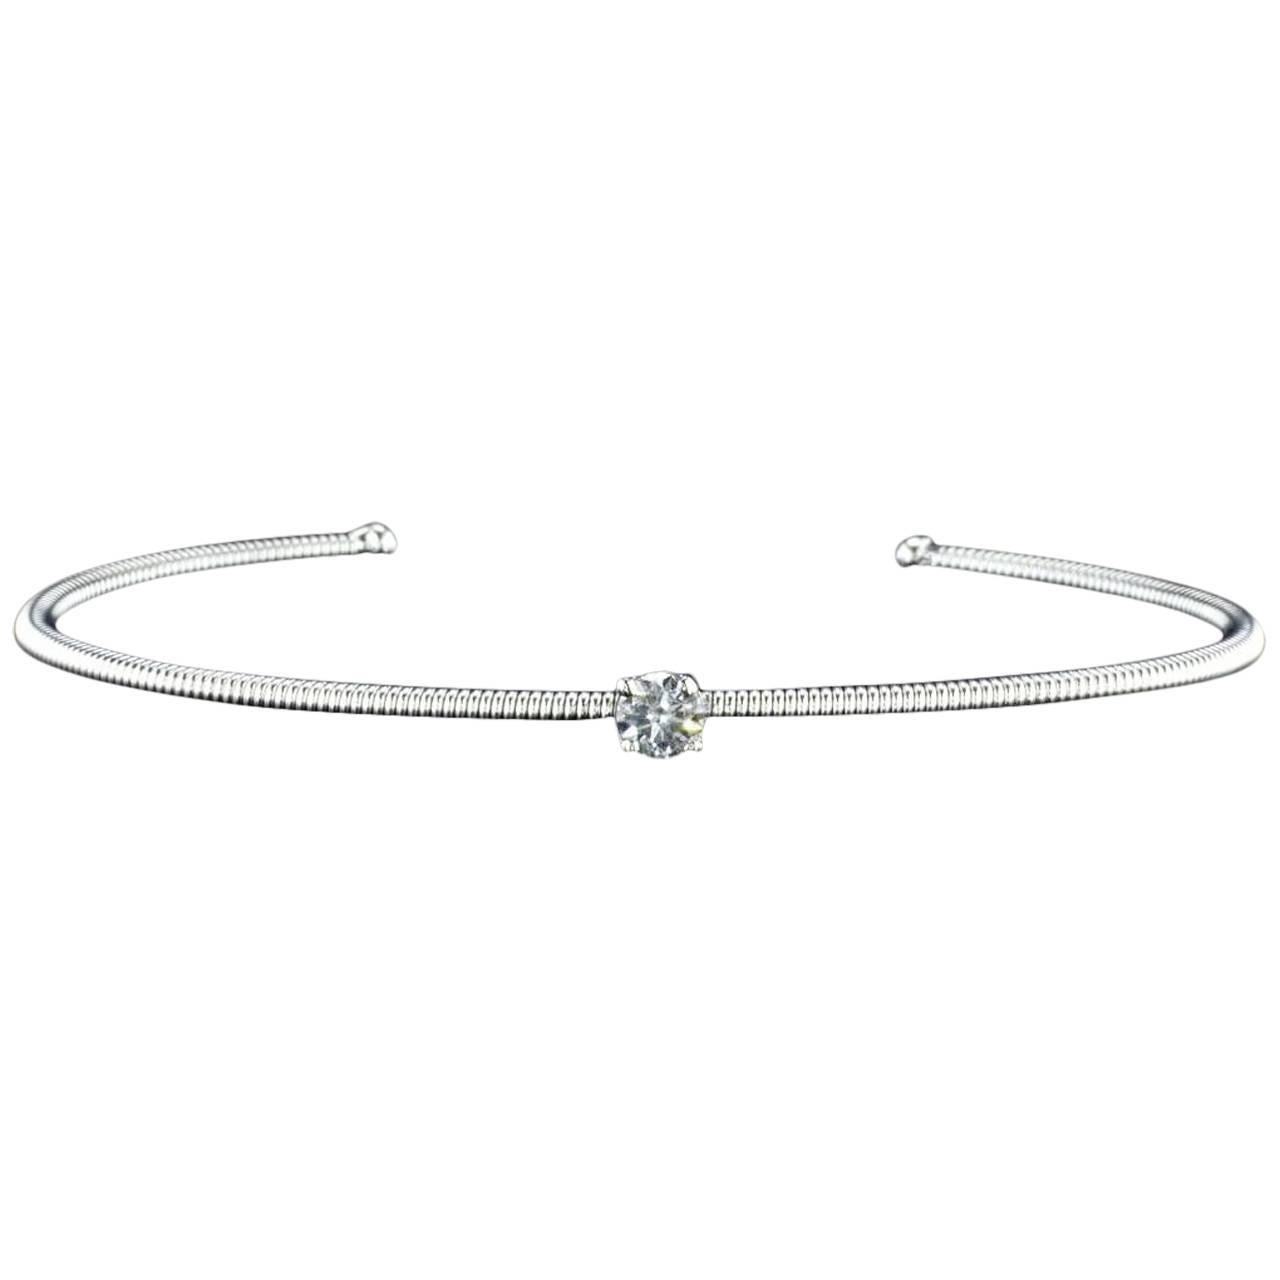 14K White Gold Spring Bangle Bracelet with a Center Diamond